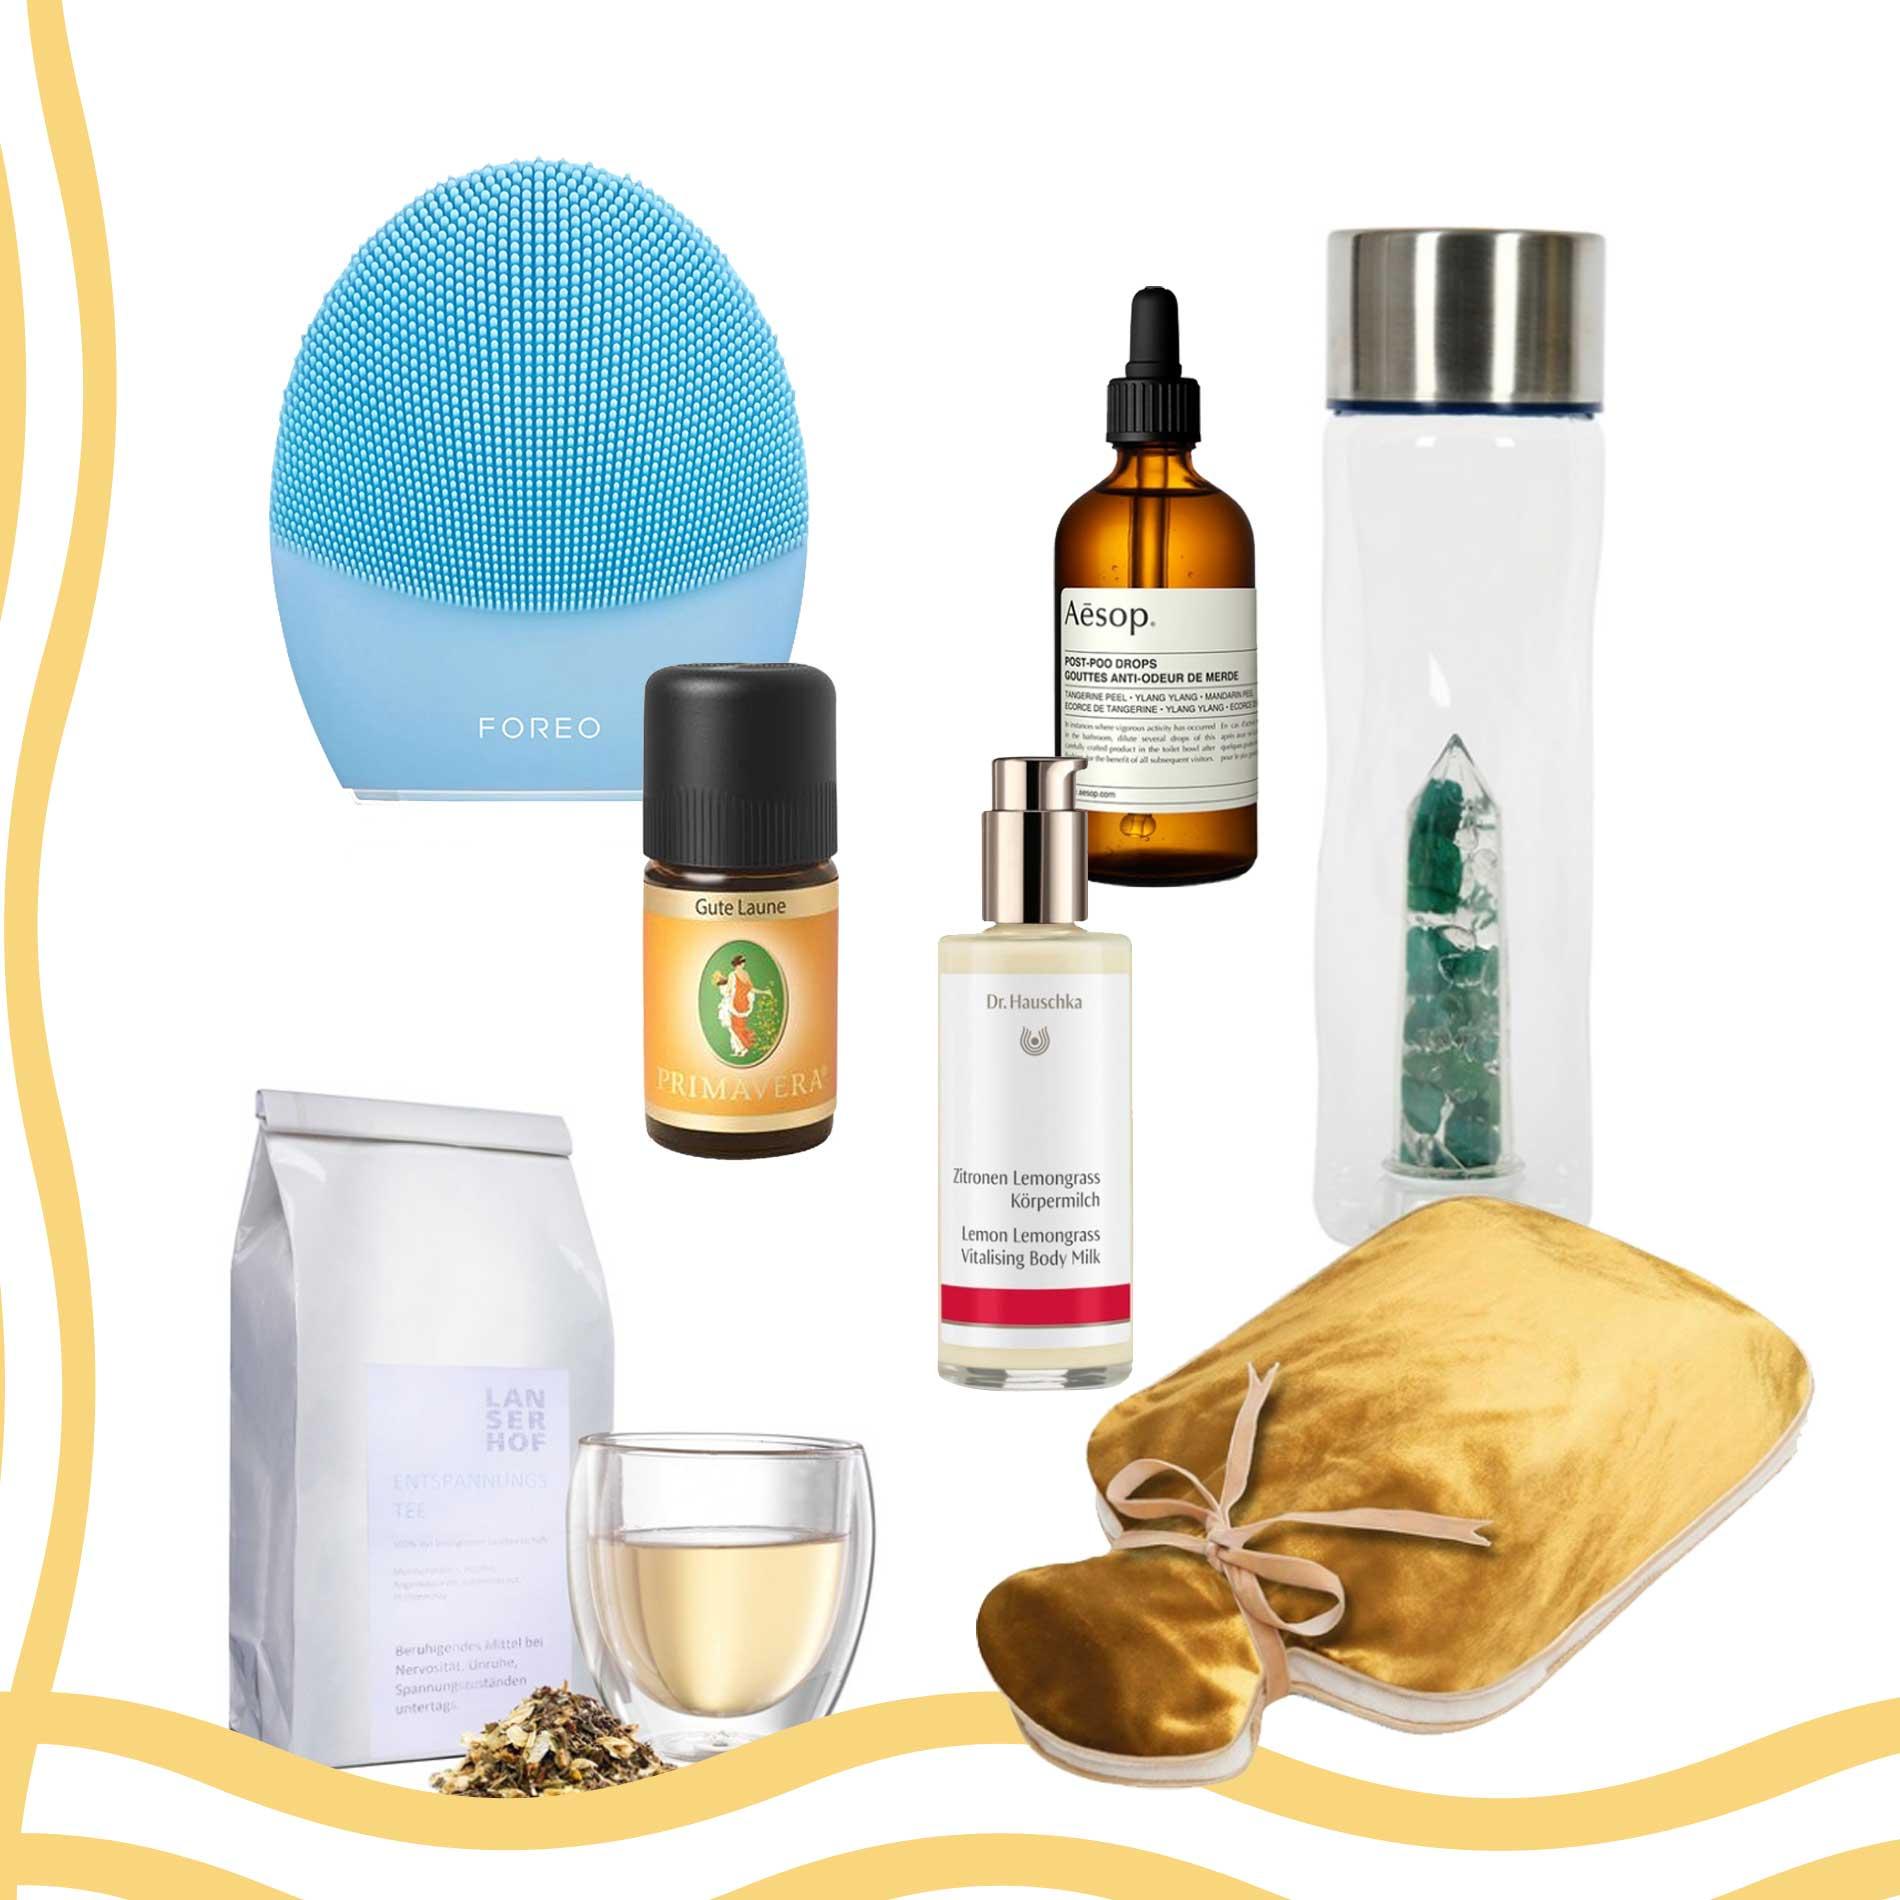 Gift Guide für Wellness Liebhaber*innen, Beauty, Wellness, Geschenke, Geschenkideen, Geschenke zu Weihnachten, Gift Guide, Wellness